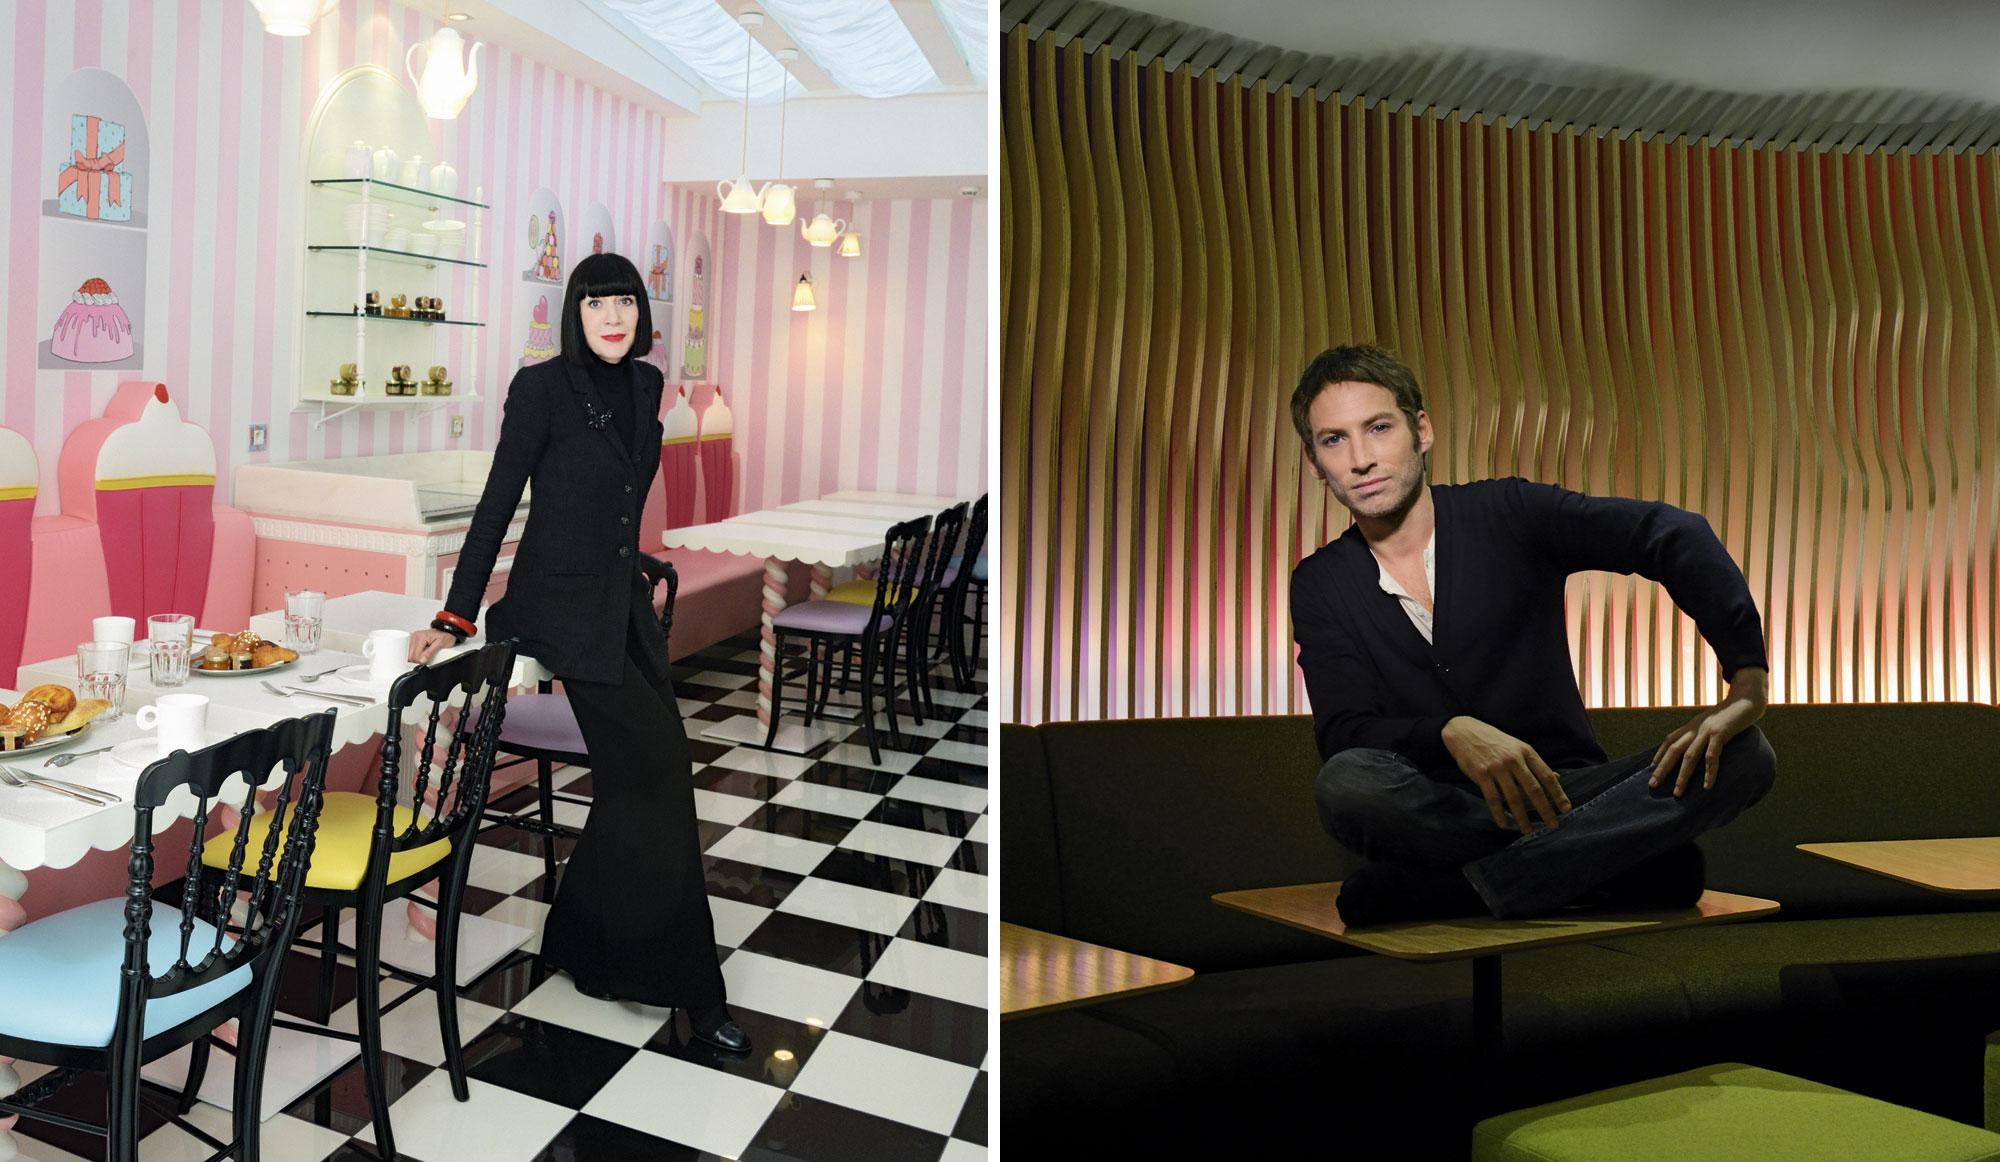 chantal thomass ora ito r veillent l 39 h tellerie parisienne. Black Bedroom Furniture Sets. Home Design Ideas